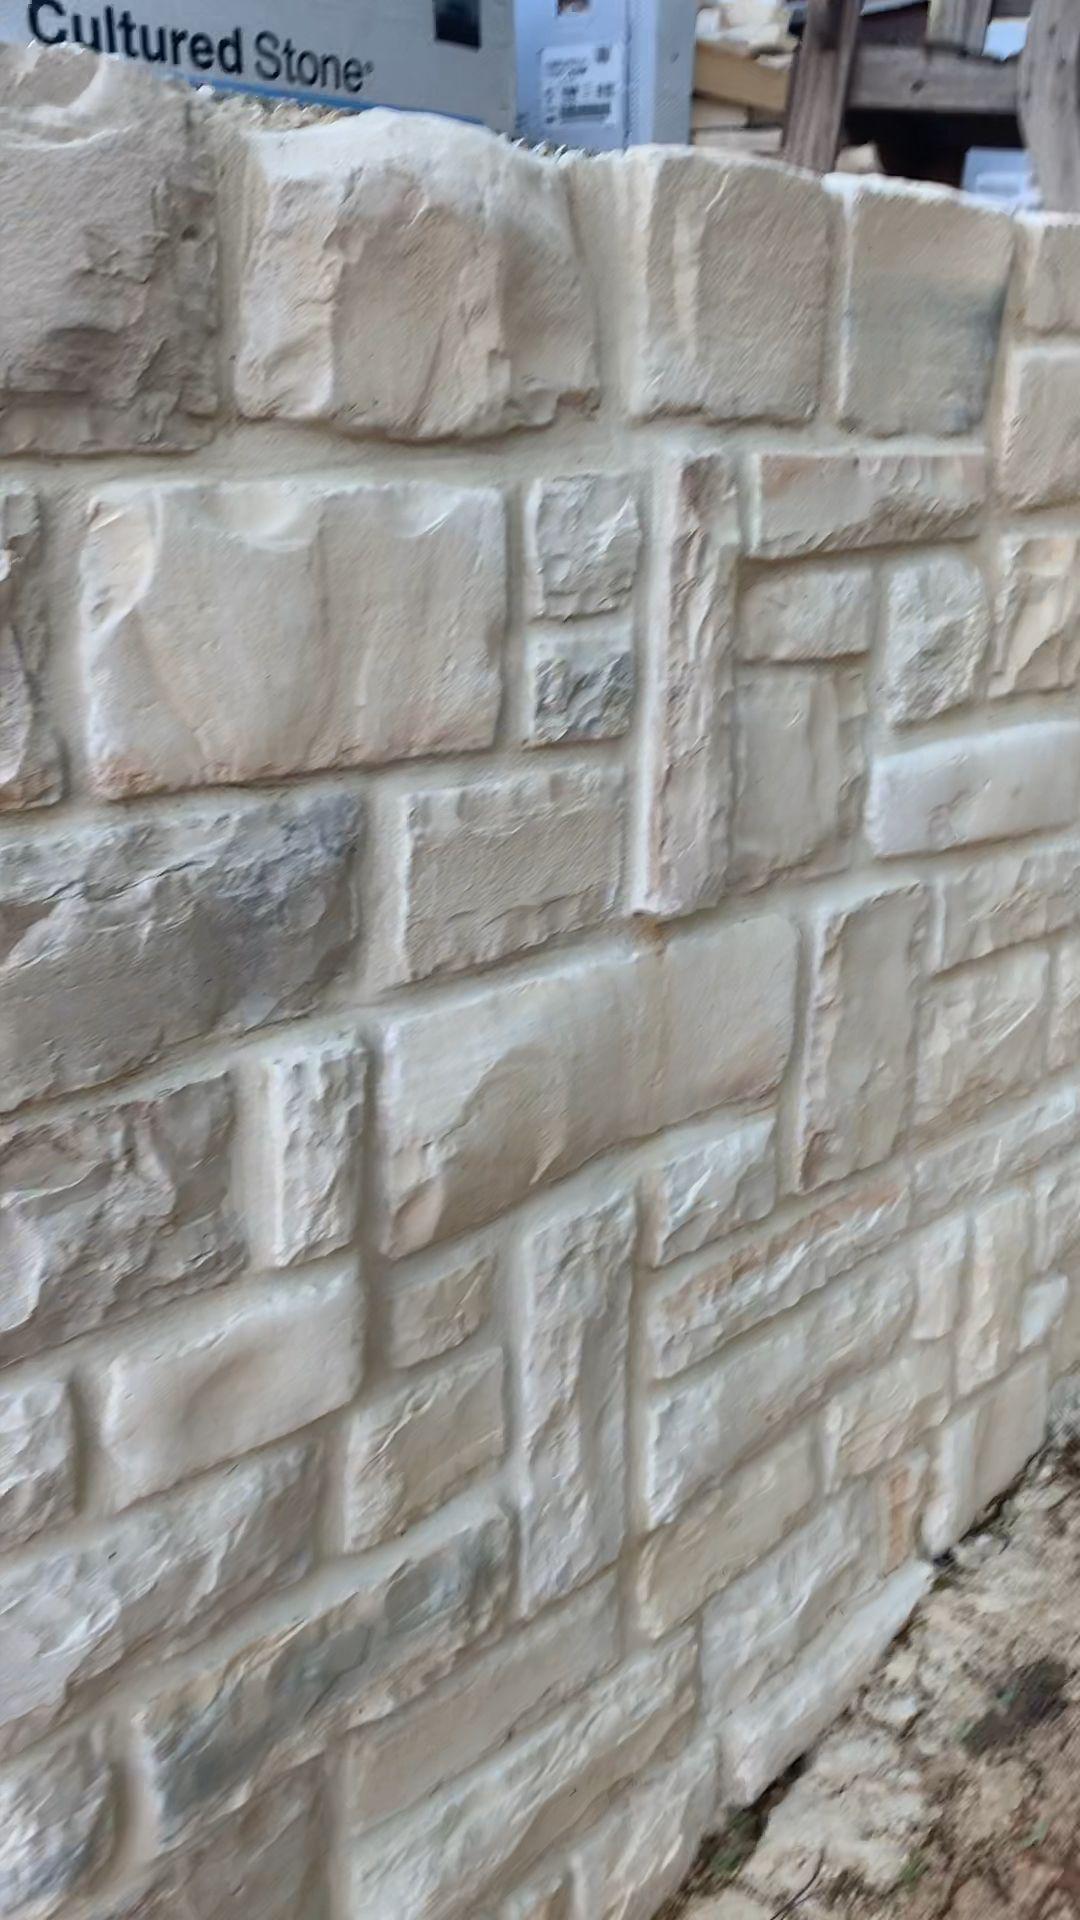 Brick Stone Masonry Brick And Stone Masonry Construction Brick Construction Masonry Stone In 2020 Masonry Construction Stone Siding Exterior Brick And Stone